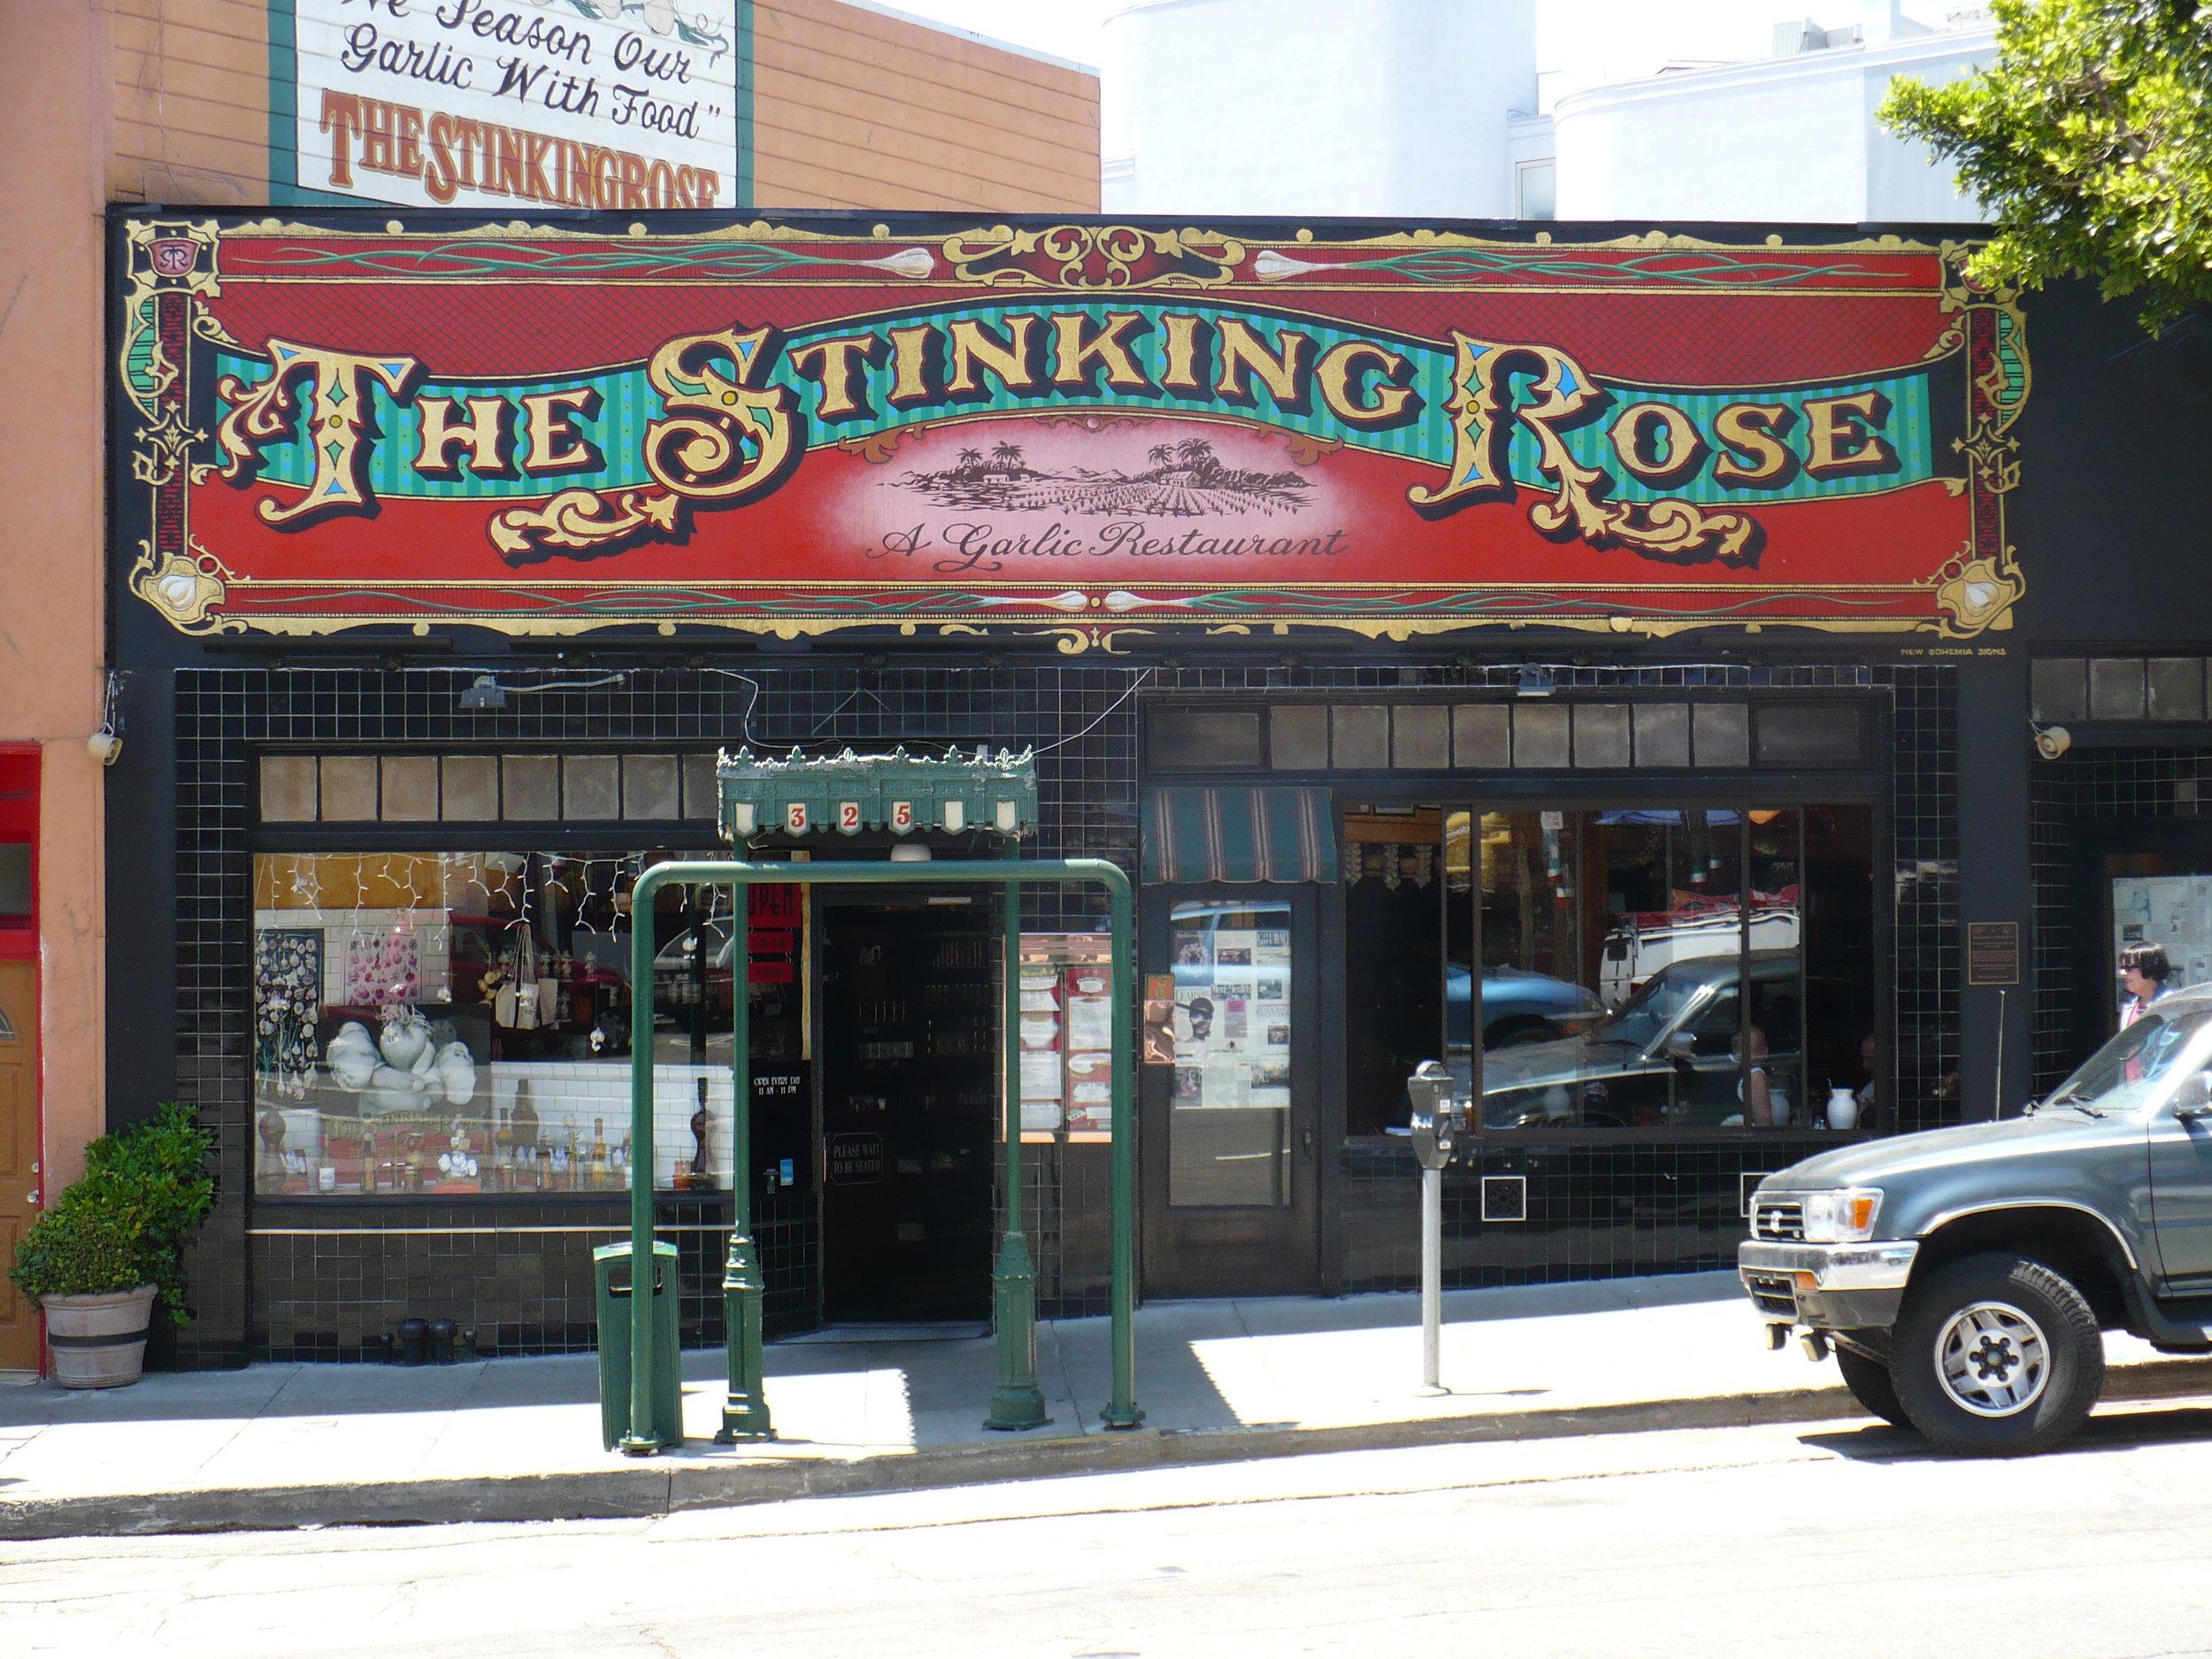 ORIG-the-stinking-rose_3327894418_o.jpg